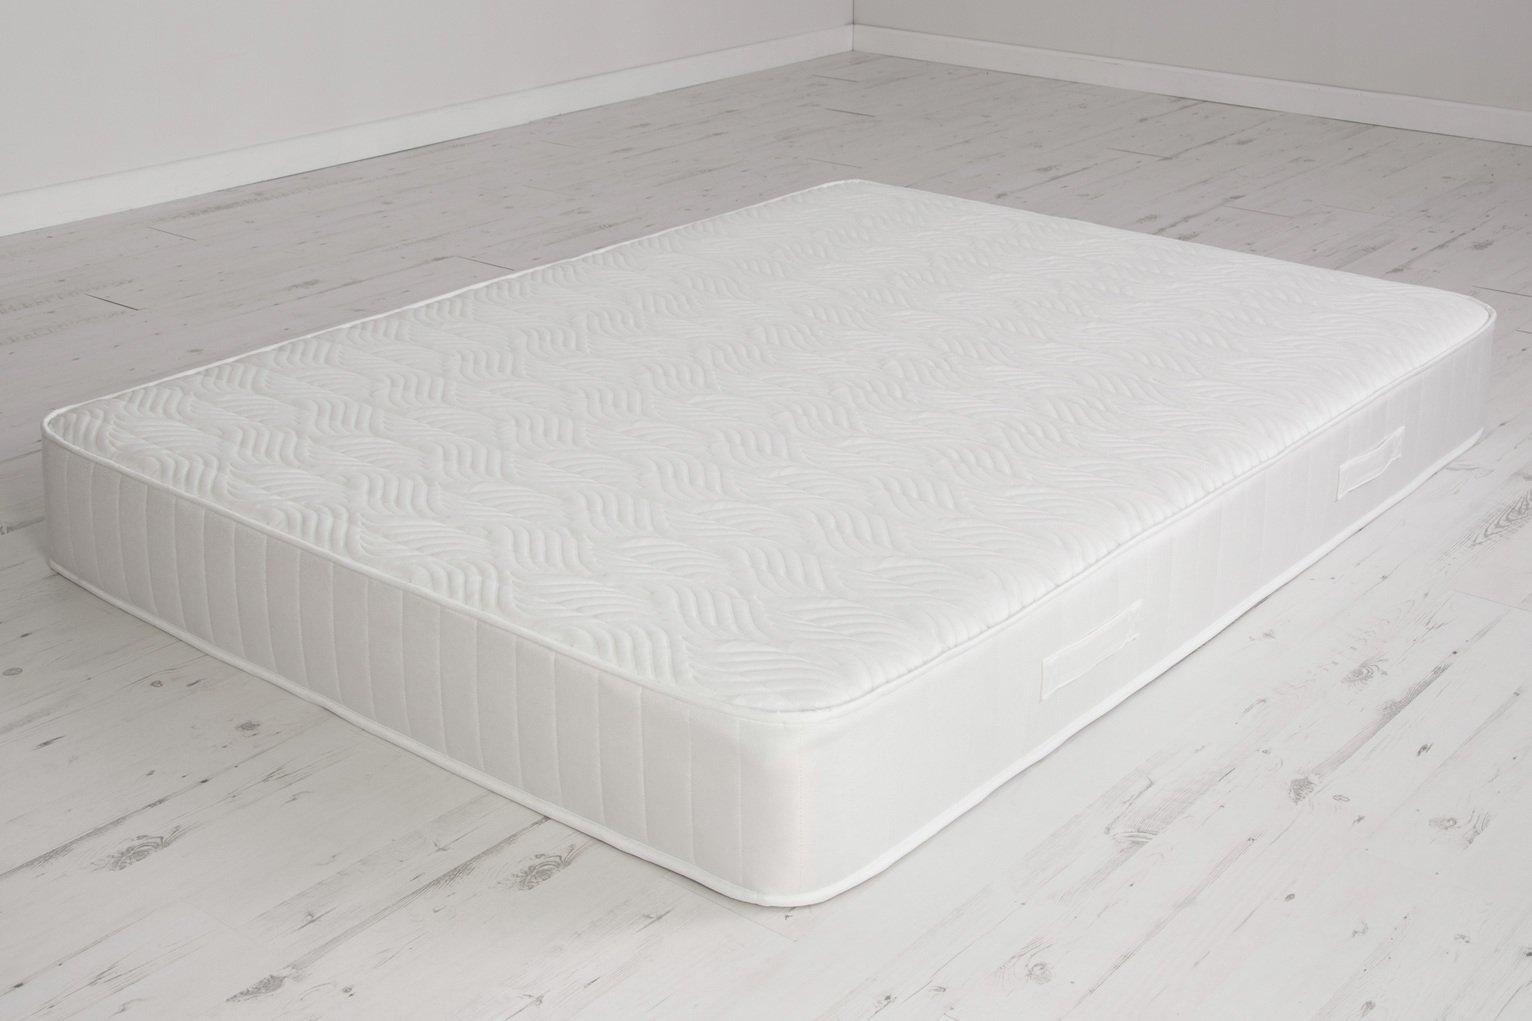 Image of Airsprung - Astall 1500 Memory Foam - Kingsize Mattress